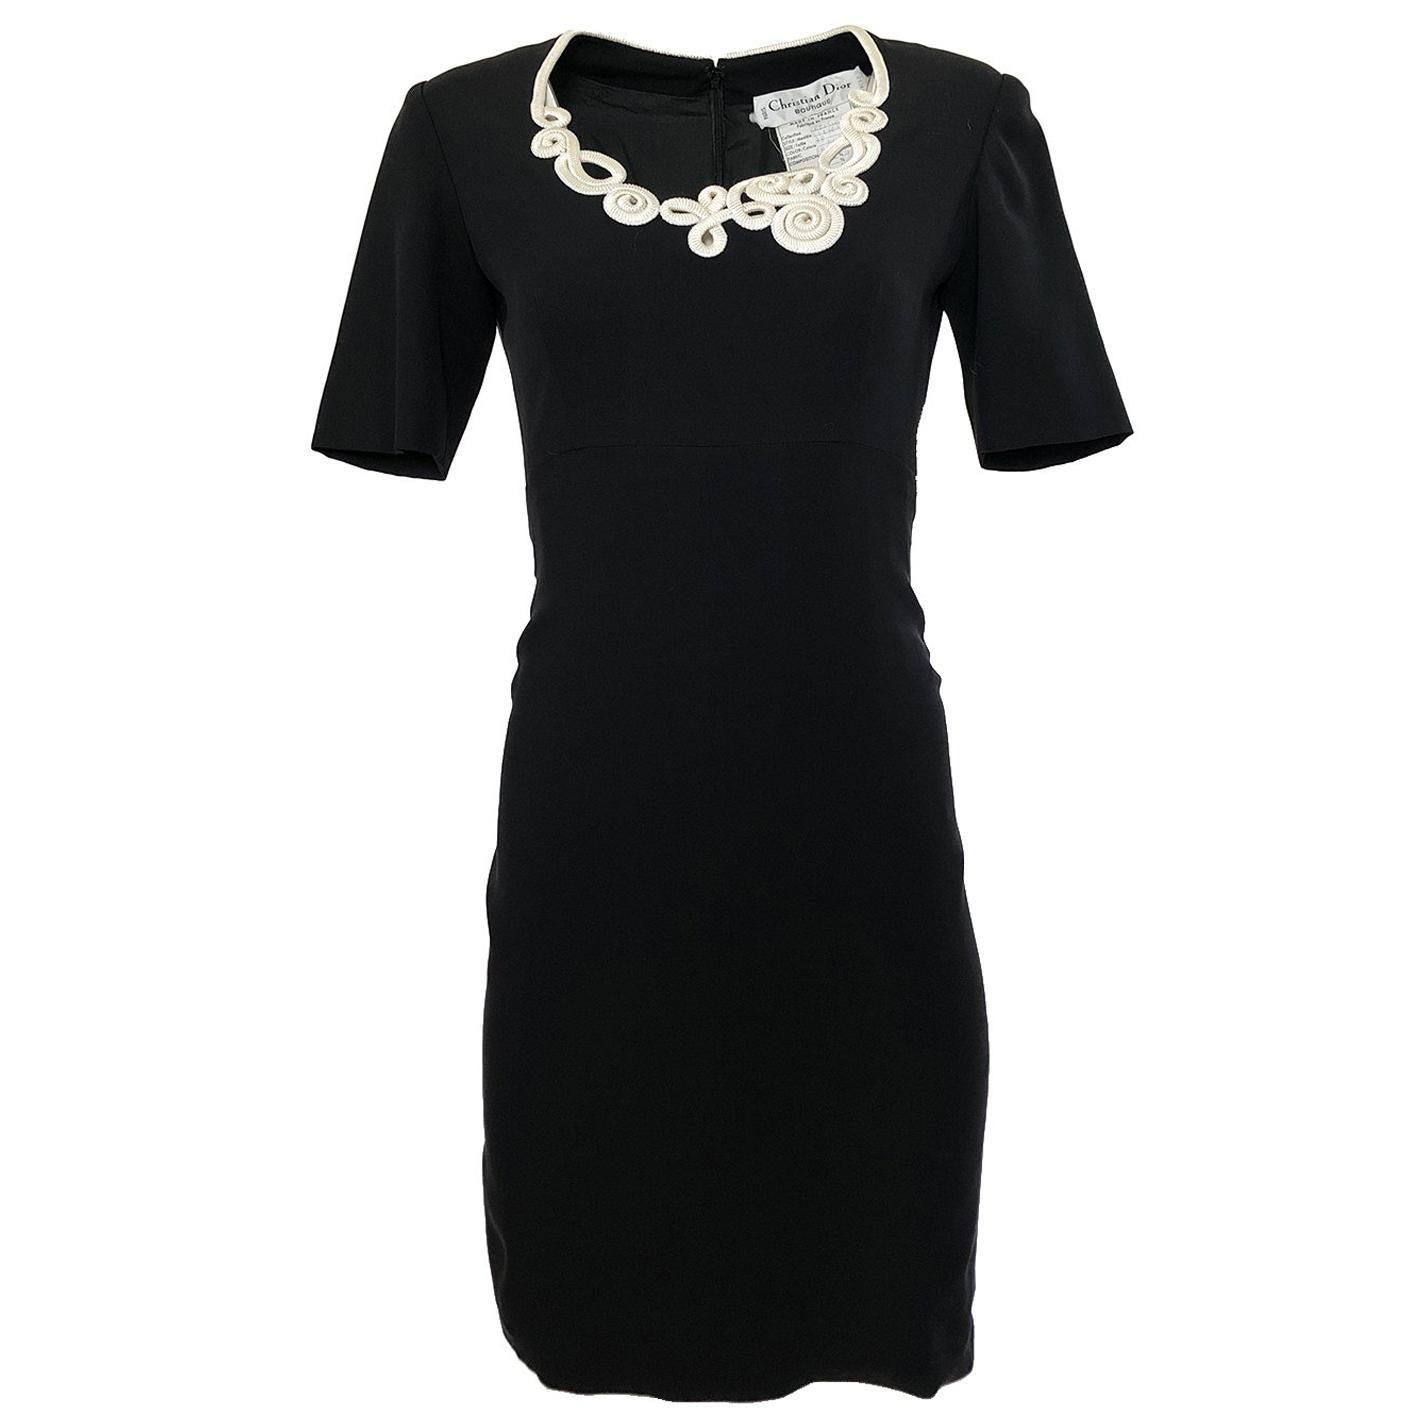 c493a68c890 Vintage Christian Dior Day Dresses - 177 For Sale at 1stdibs